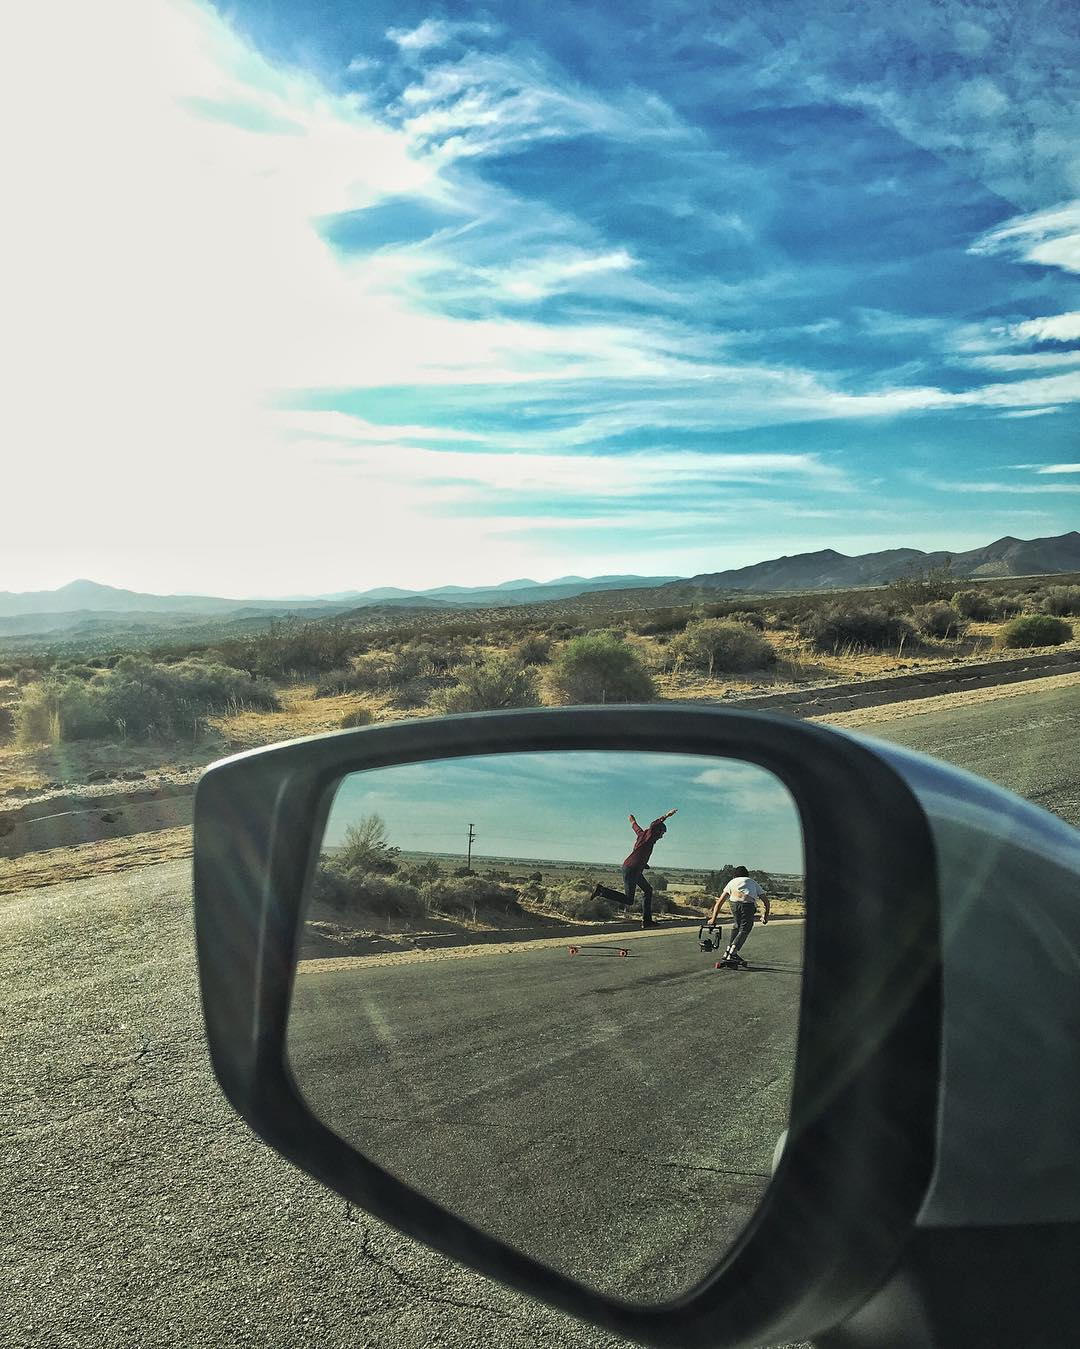 #OrangatangAmbassador @adamstokowski floating for @perropro's camera in the hot desert